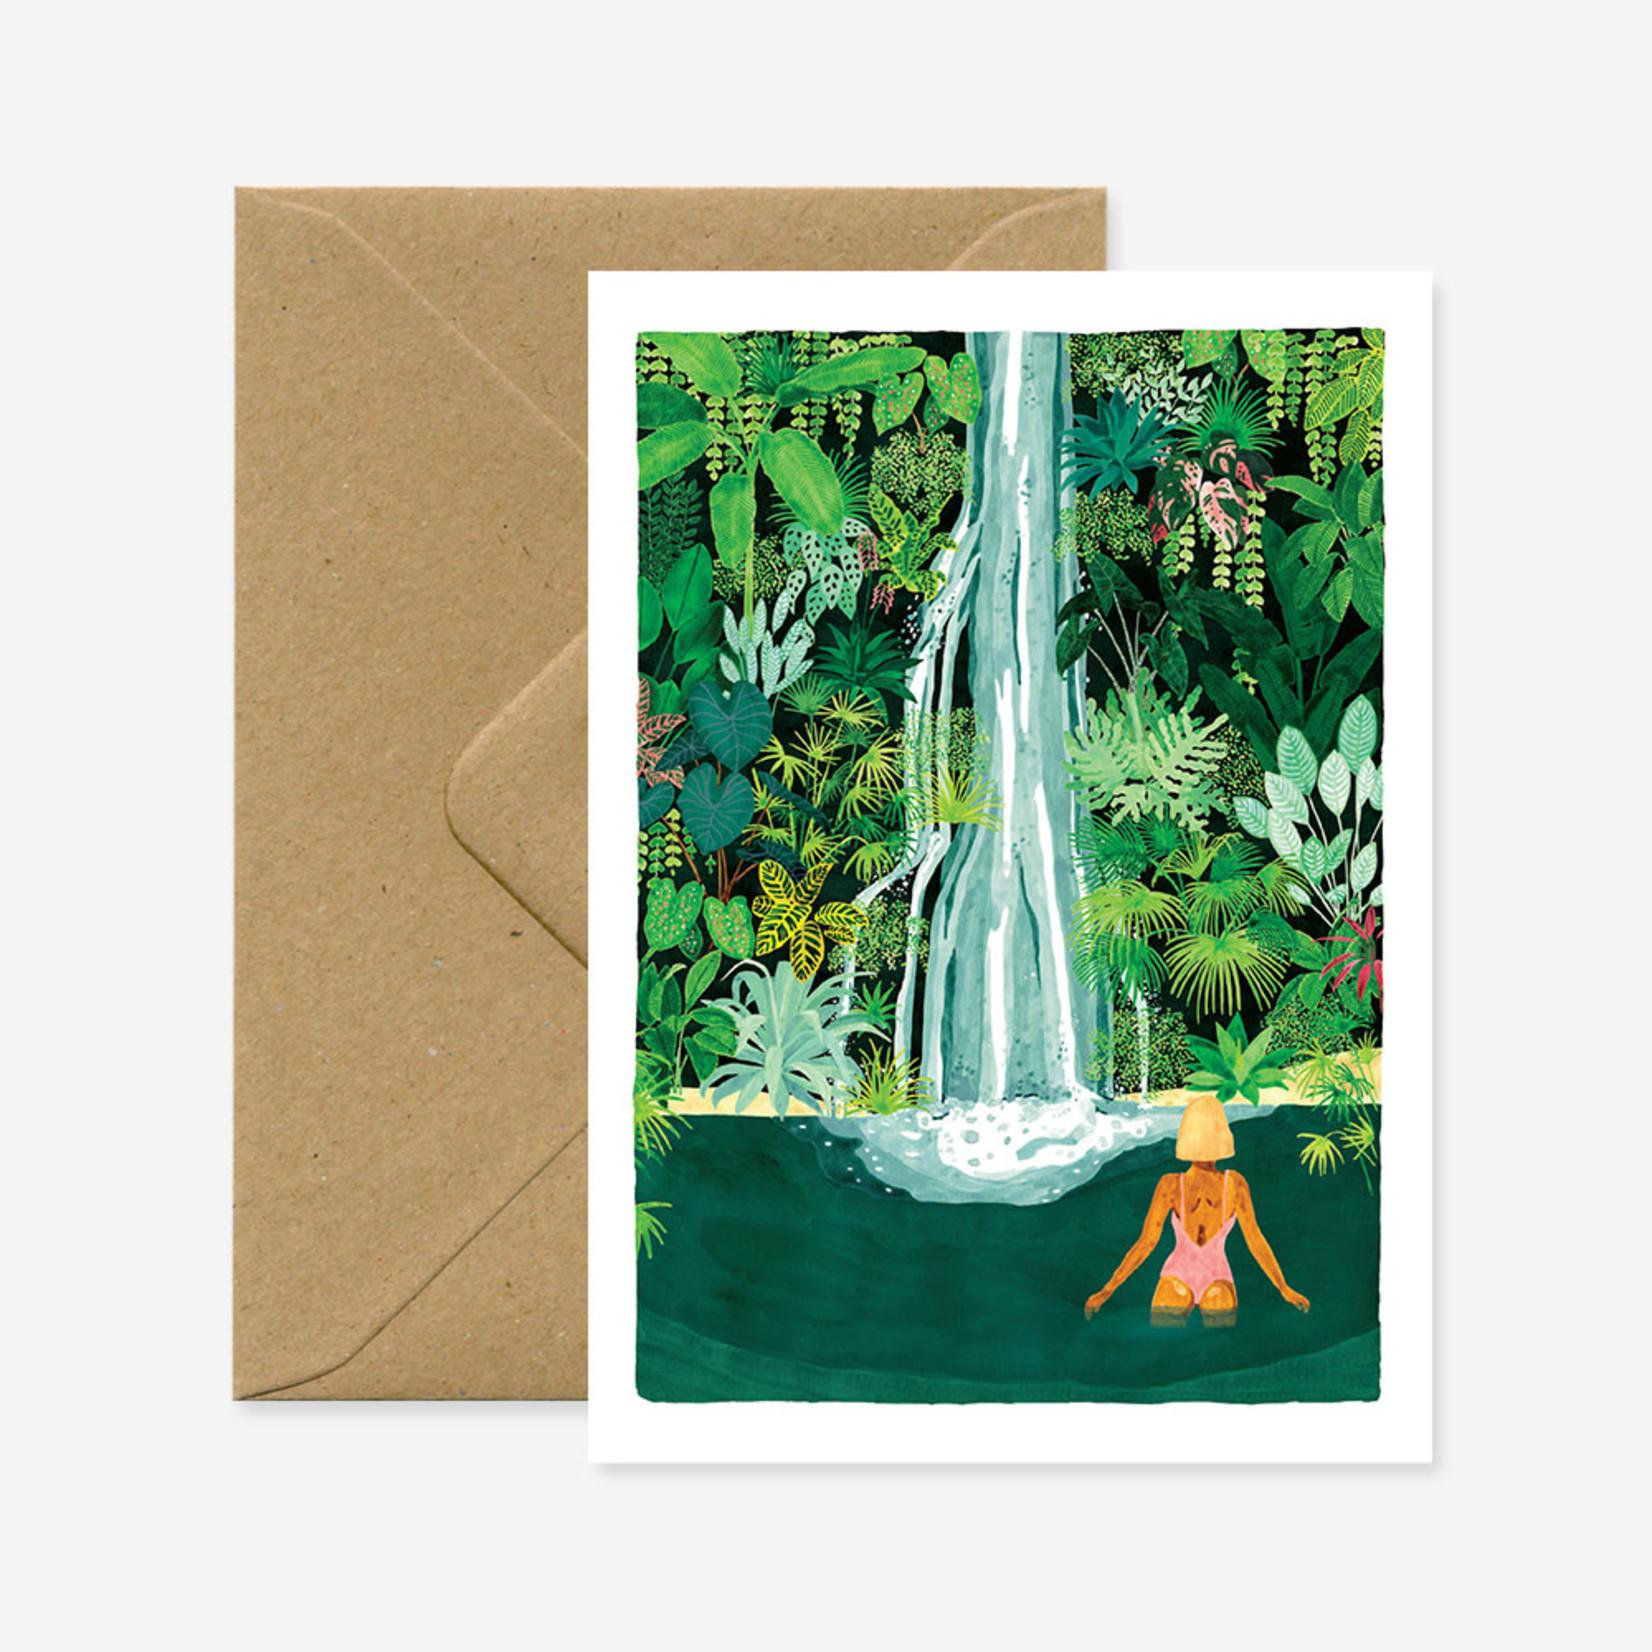 All the ways to say Wenskaart: Waterfall